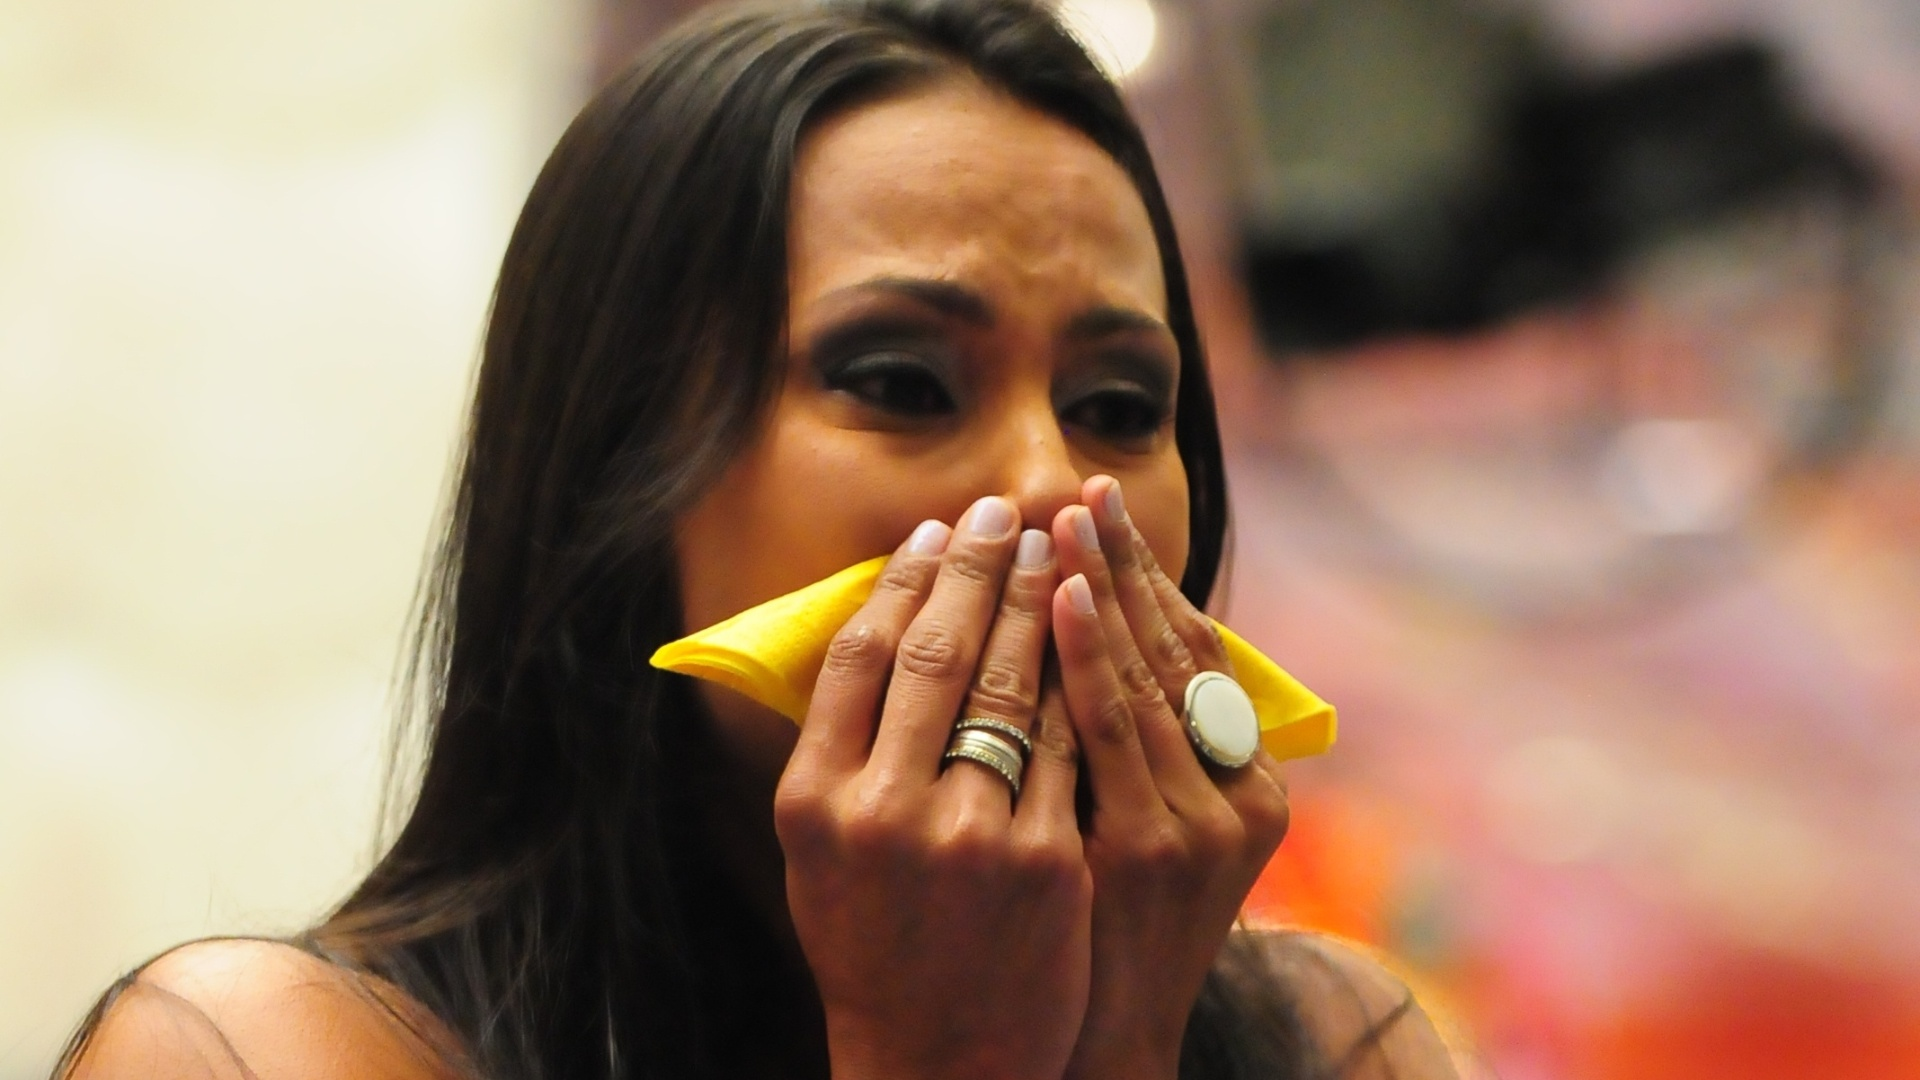 Kelly chora ao ver a família na televisão (25/3/12)